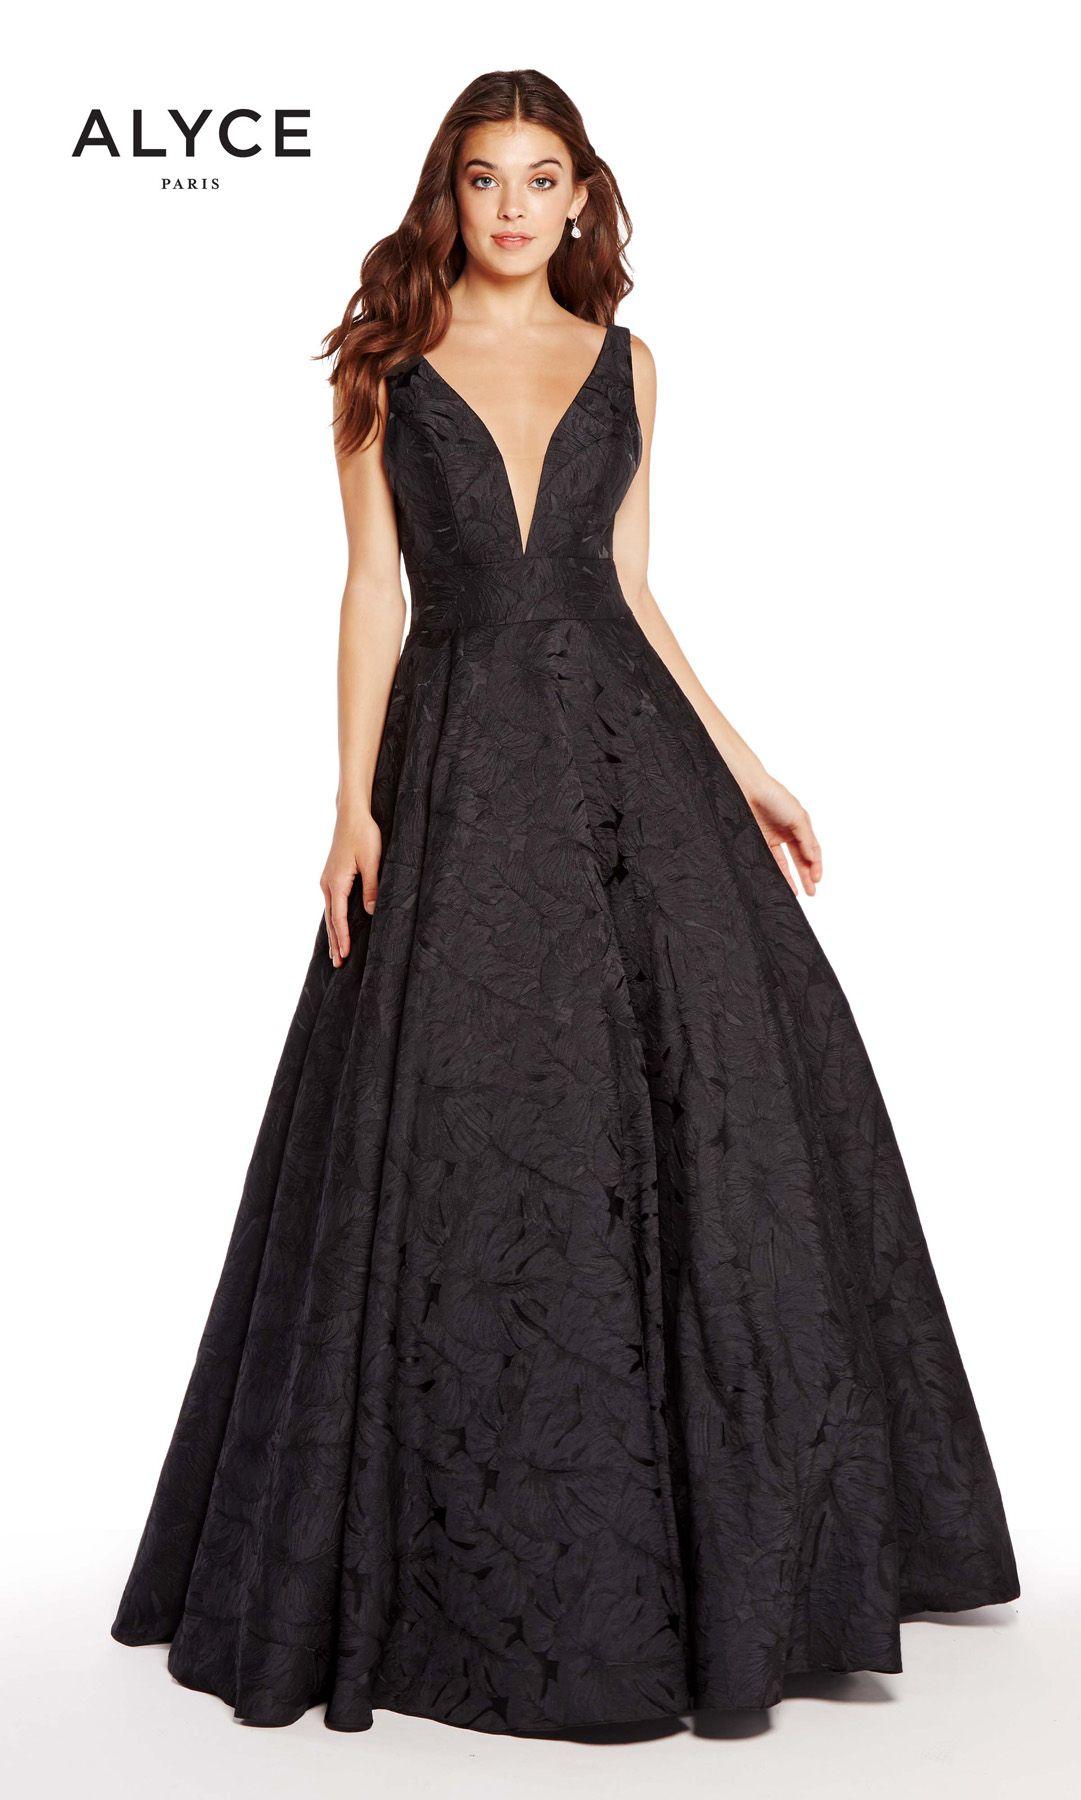 2051c74897 Alyce Paris 60171 - International Prom Association Dresses  promdress